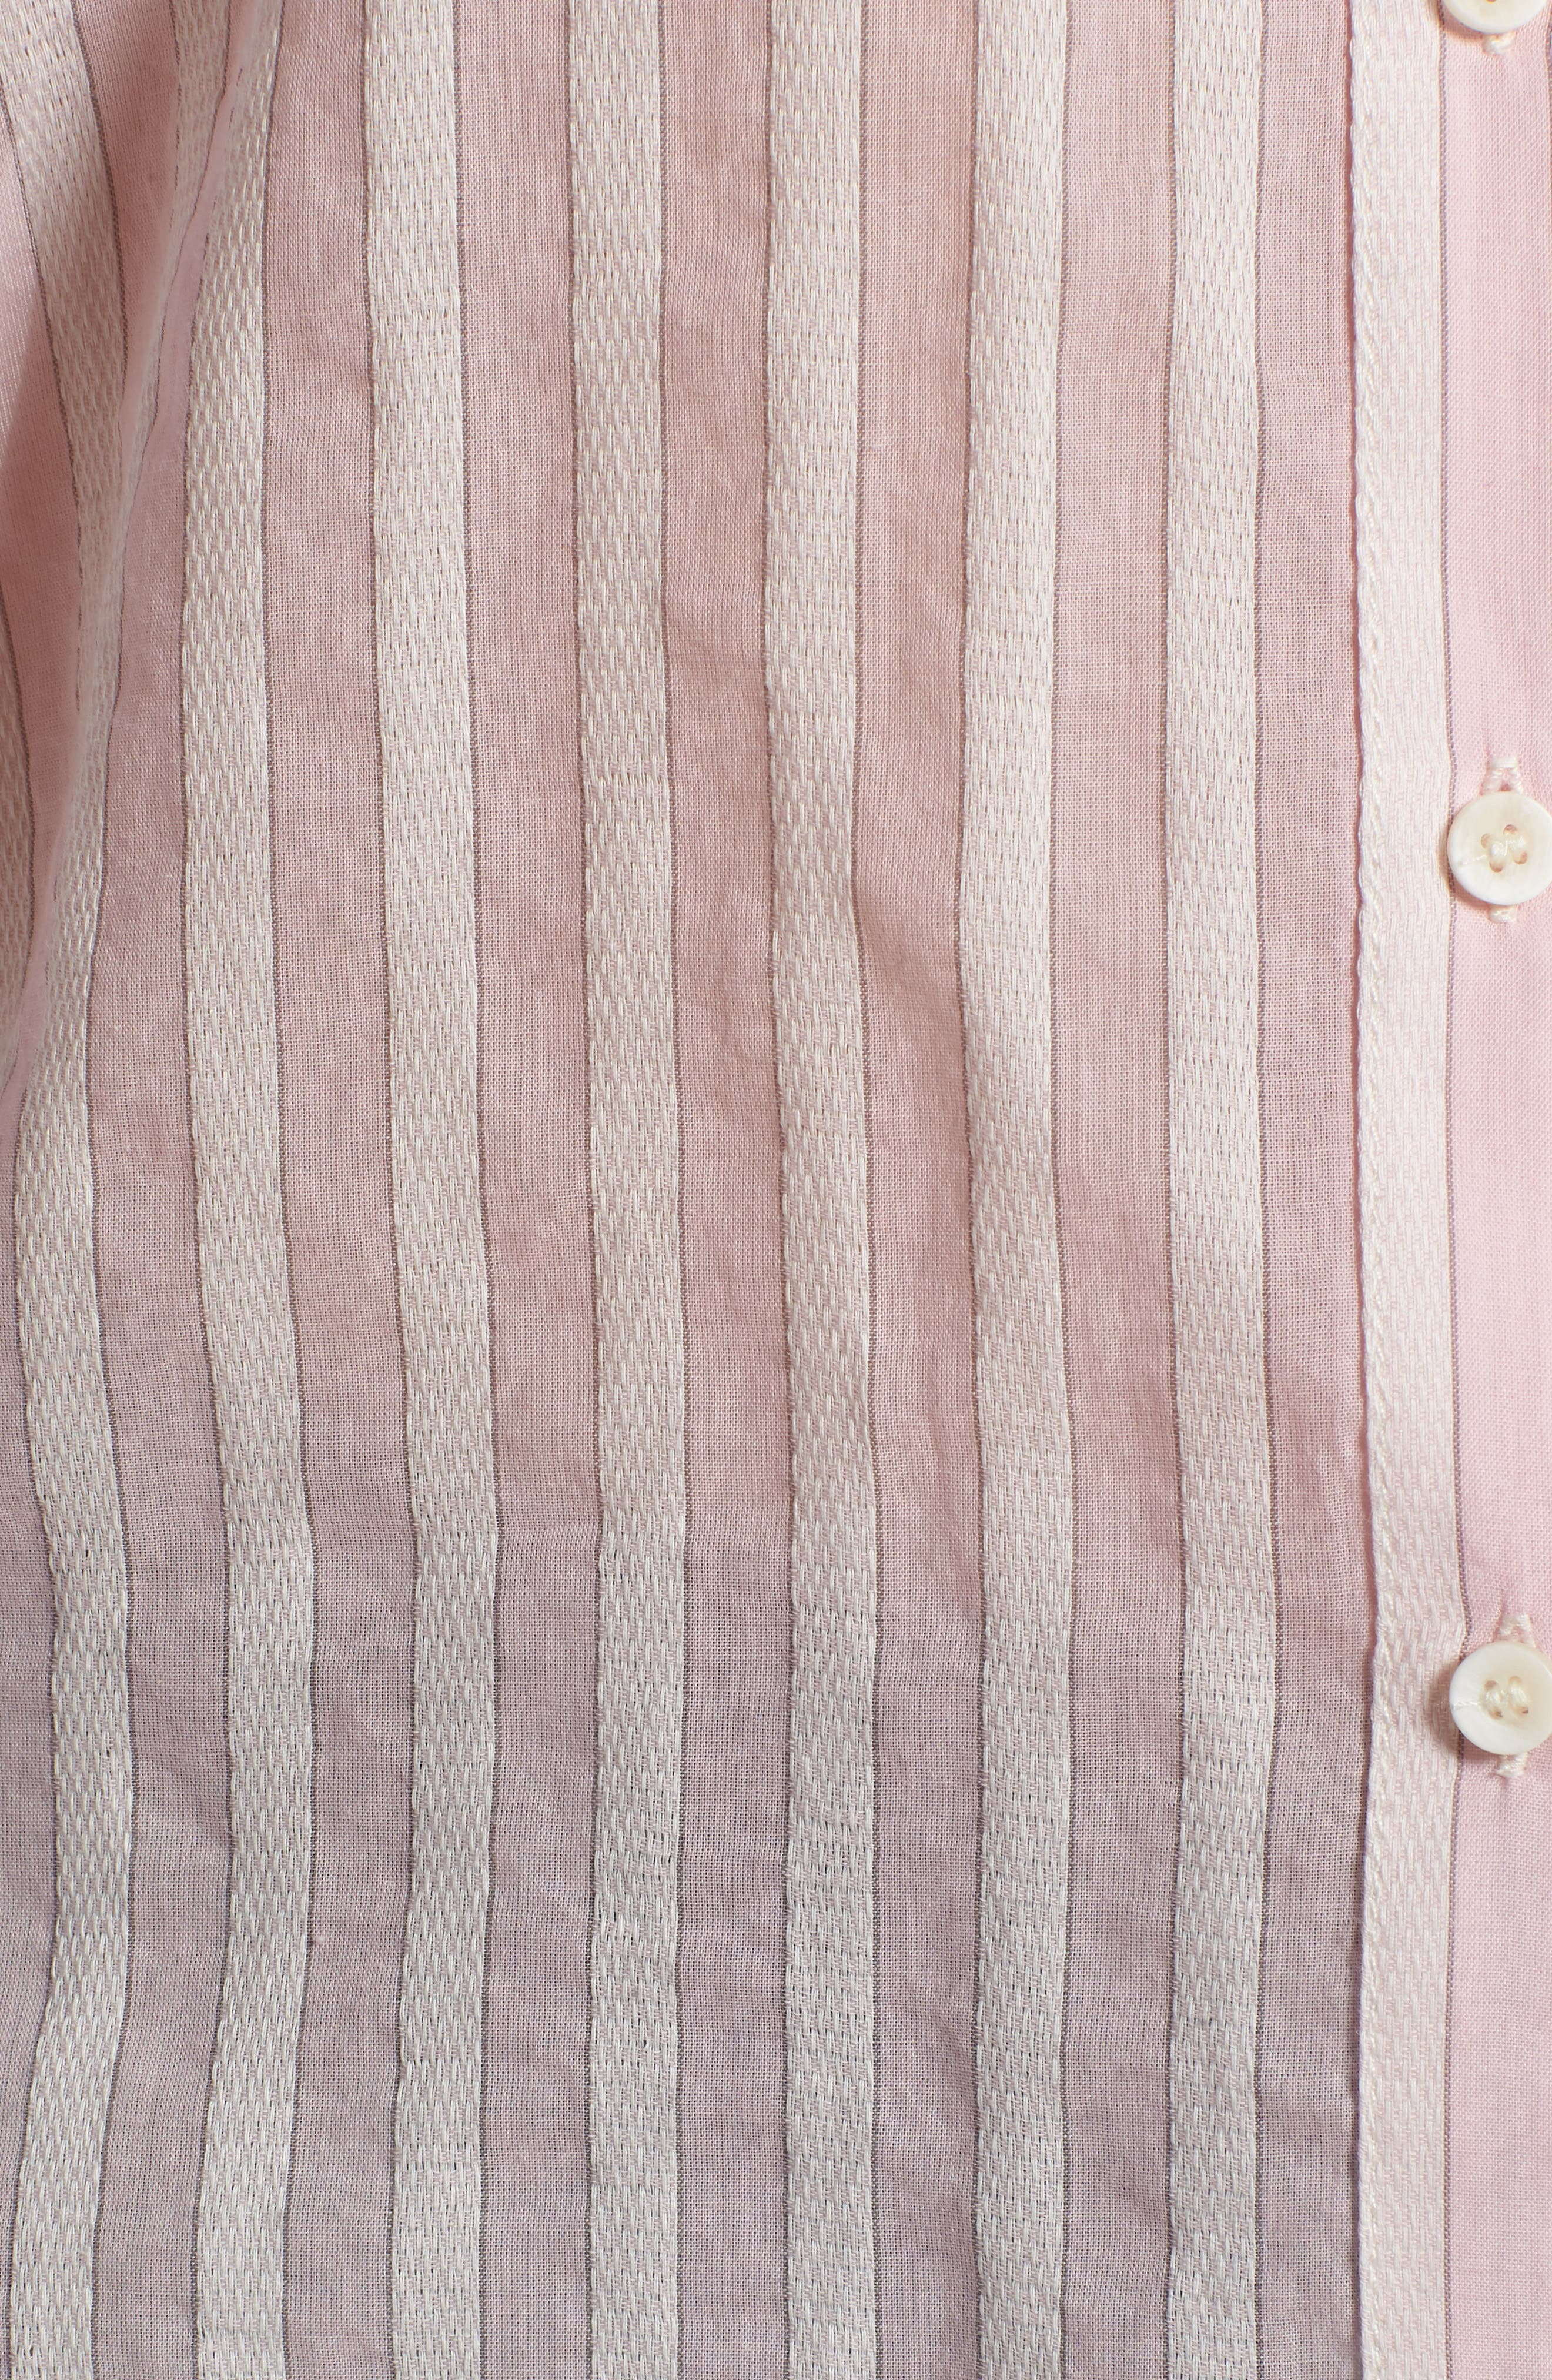 Stripe Shirt,                             Alternate thumbnail 6, color,                             PINK OPAL TAILOR STRIPE